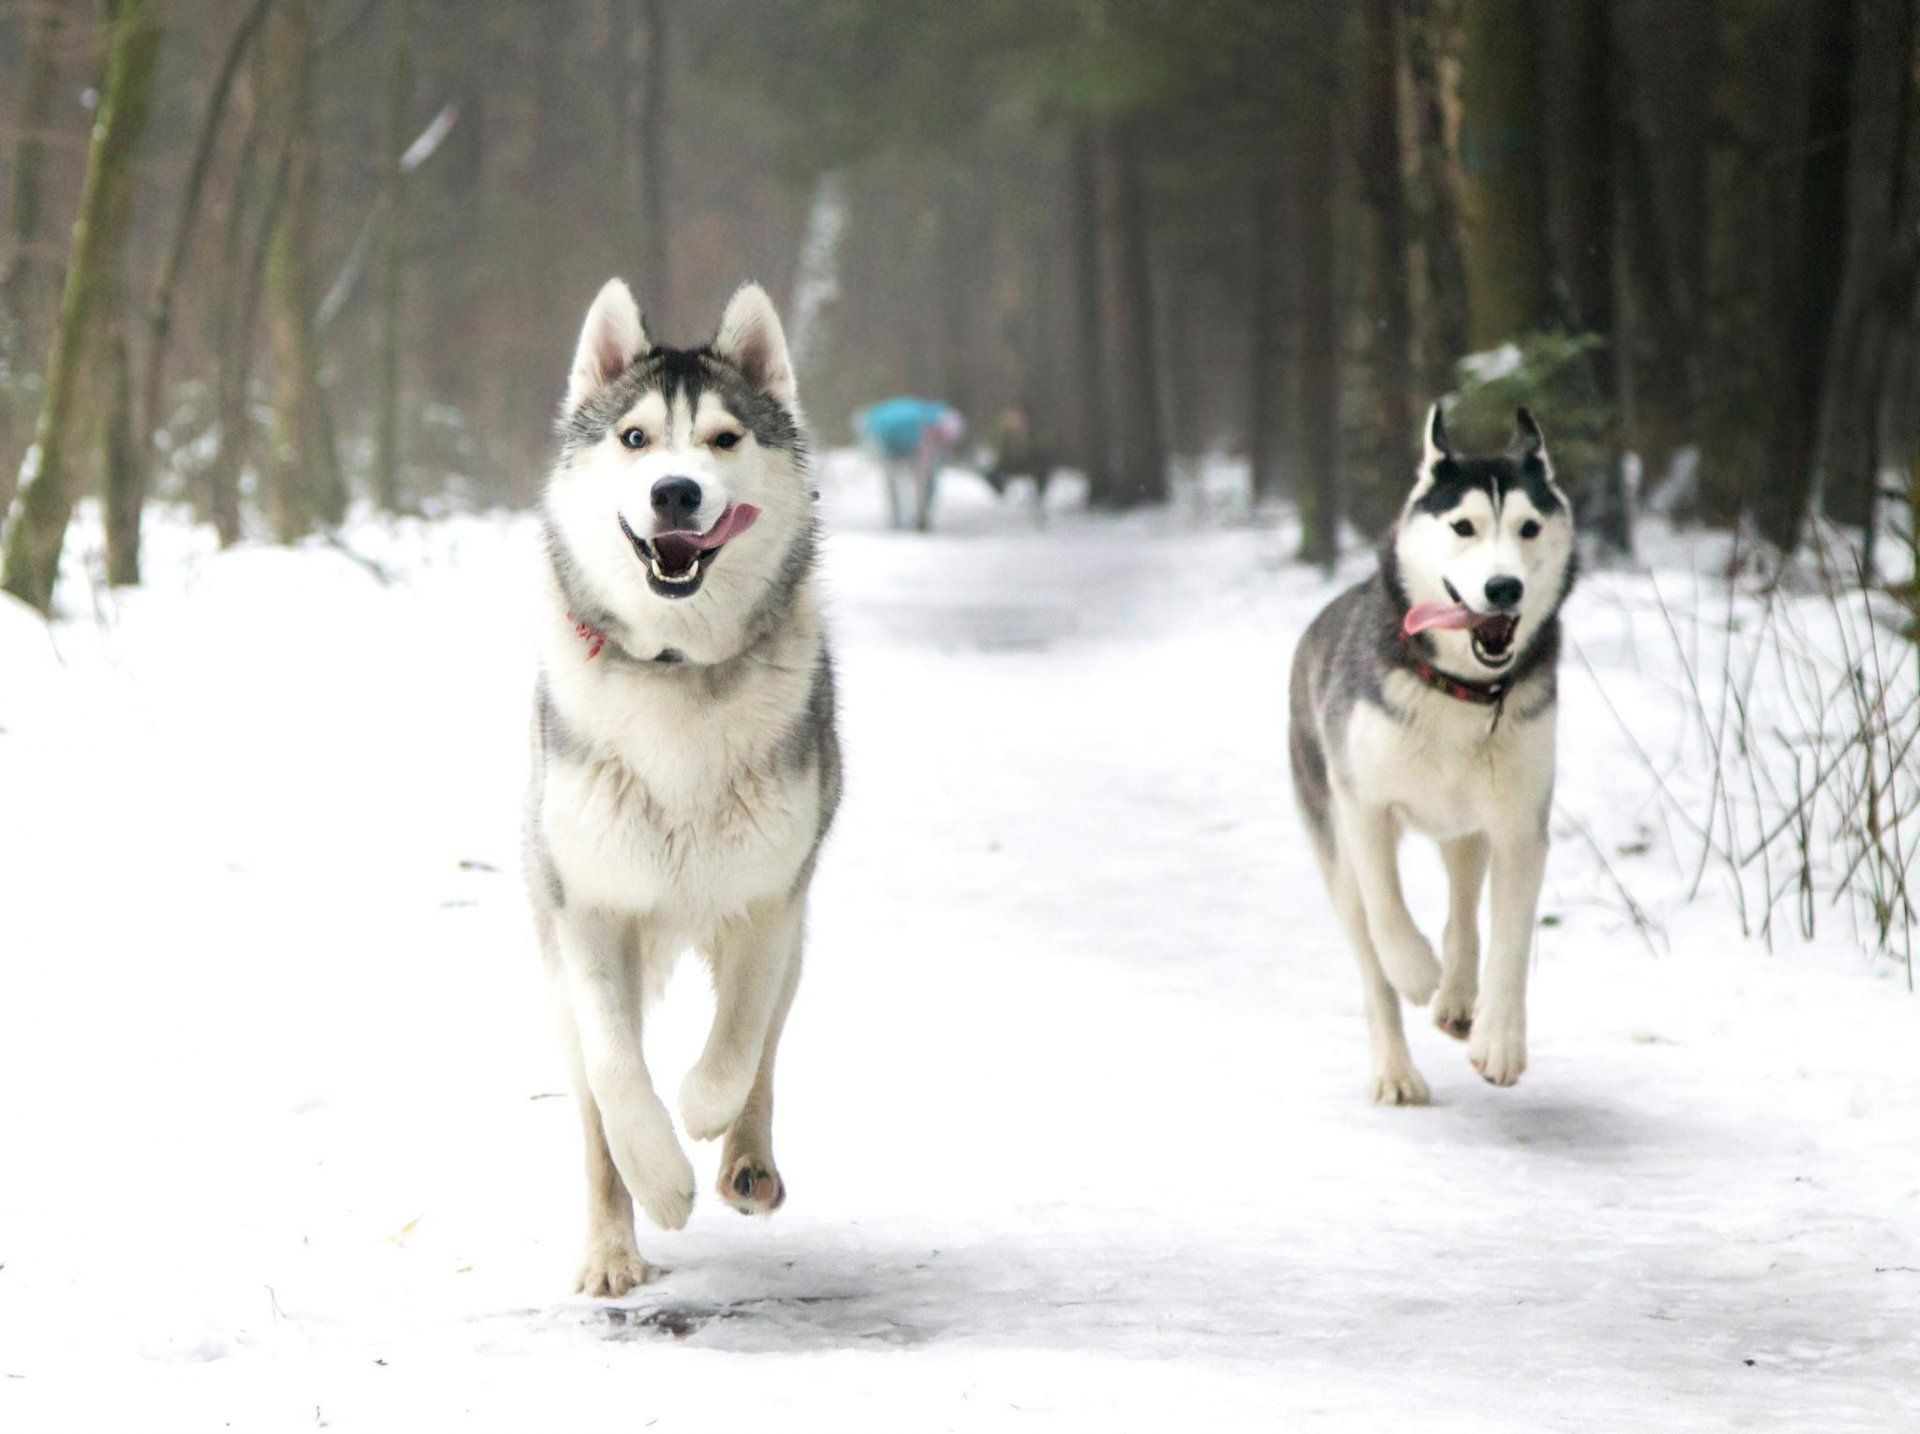 Dogs Husky Laika Winter Snow Park Running English Hd Wallpaper